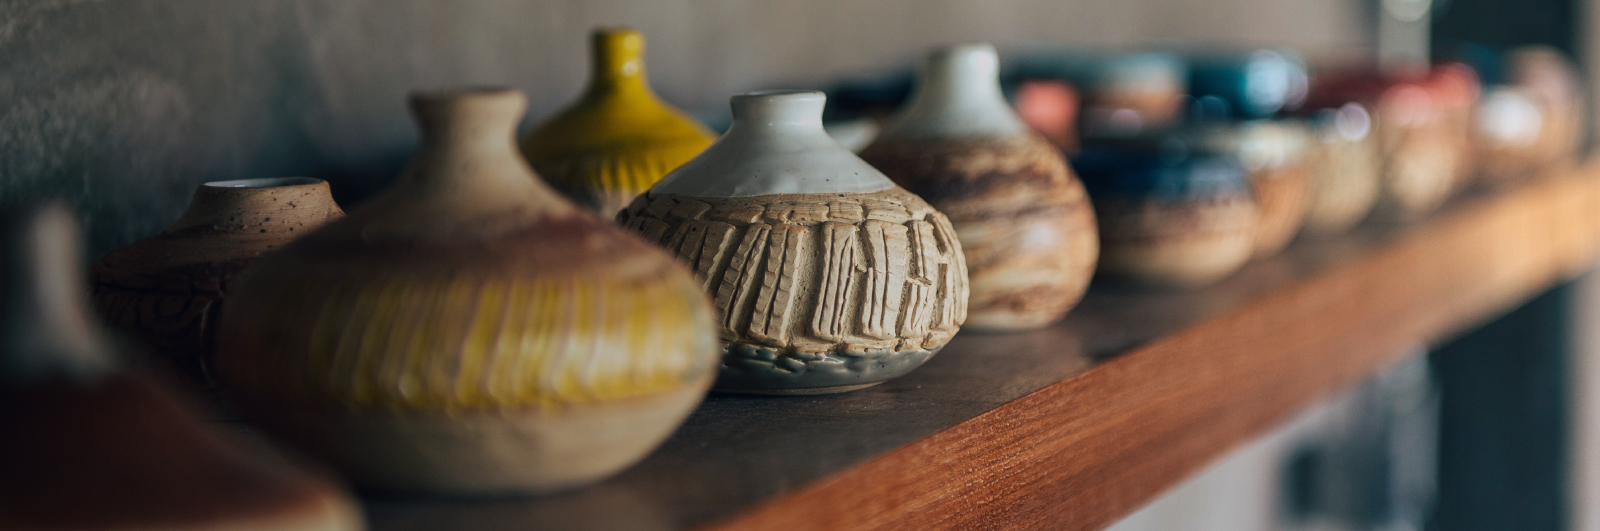 Handmade Vase Tour